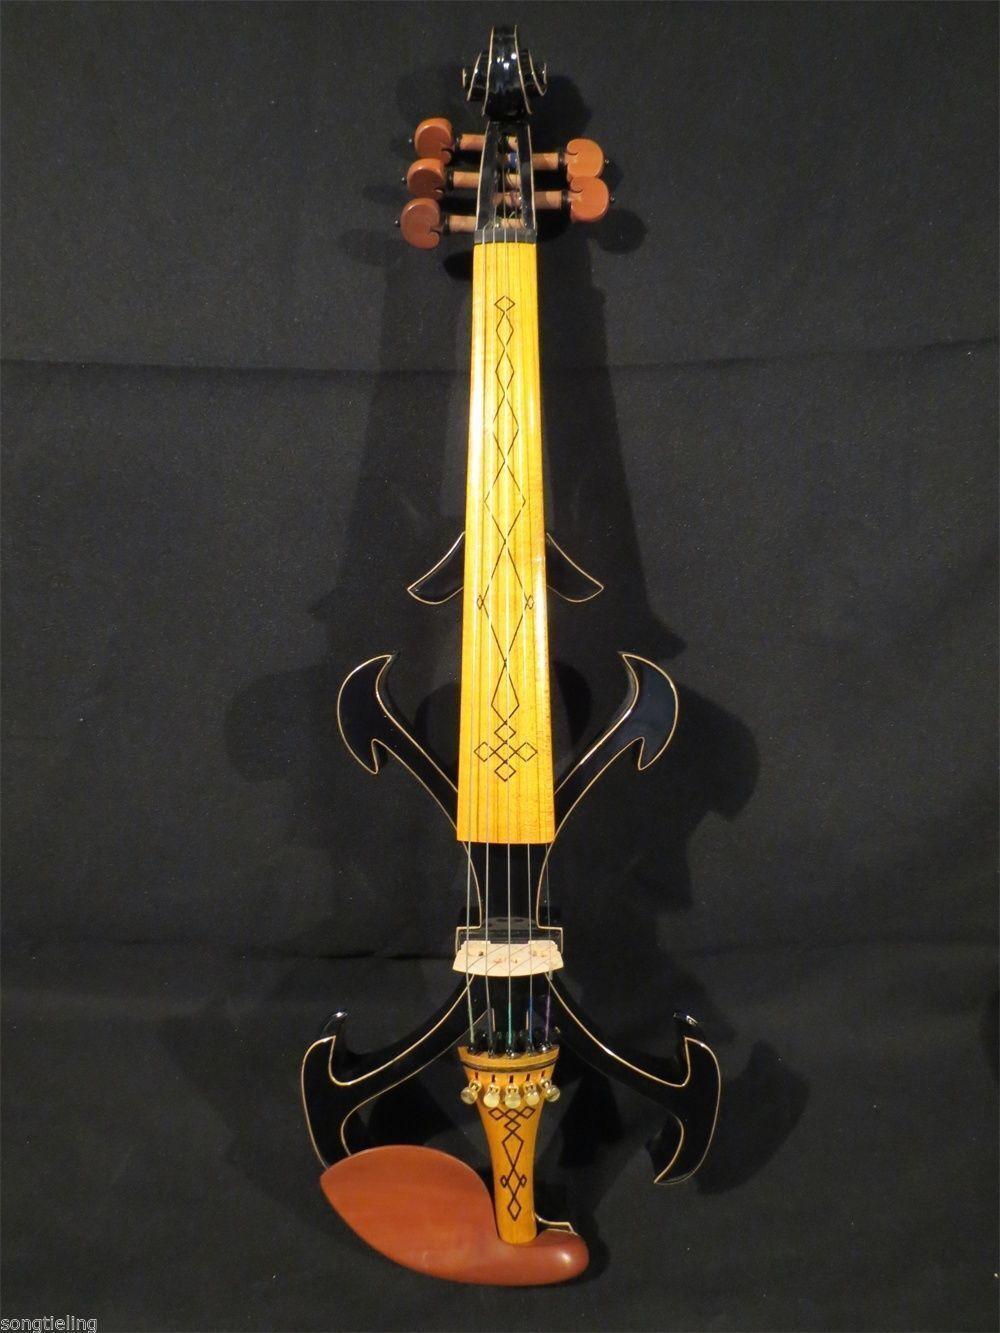 SONG Brand Top art Crazy-2 schwarz 5 strings 4 4 electric violine,resonant sound